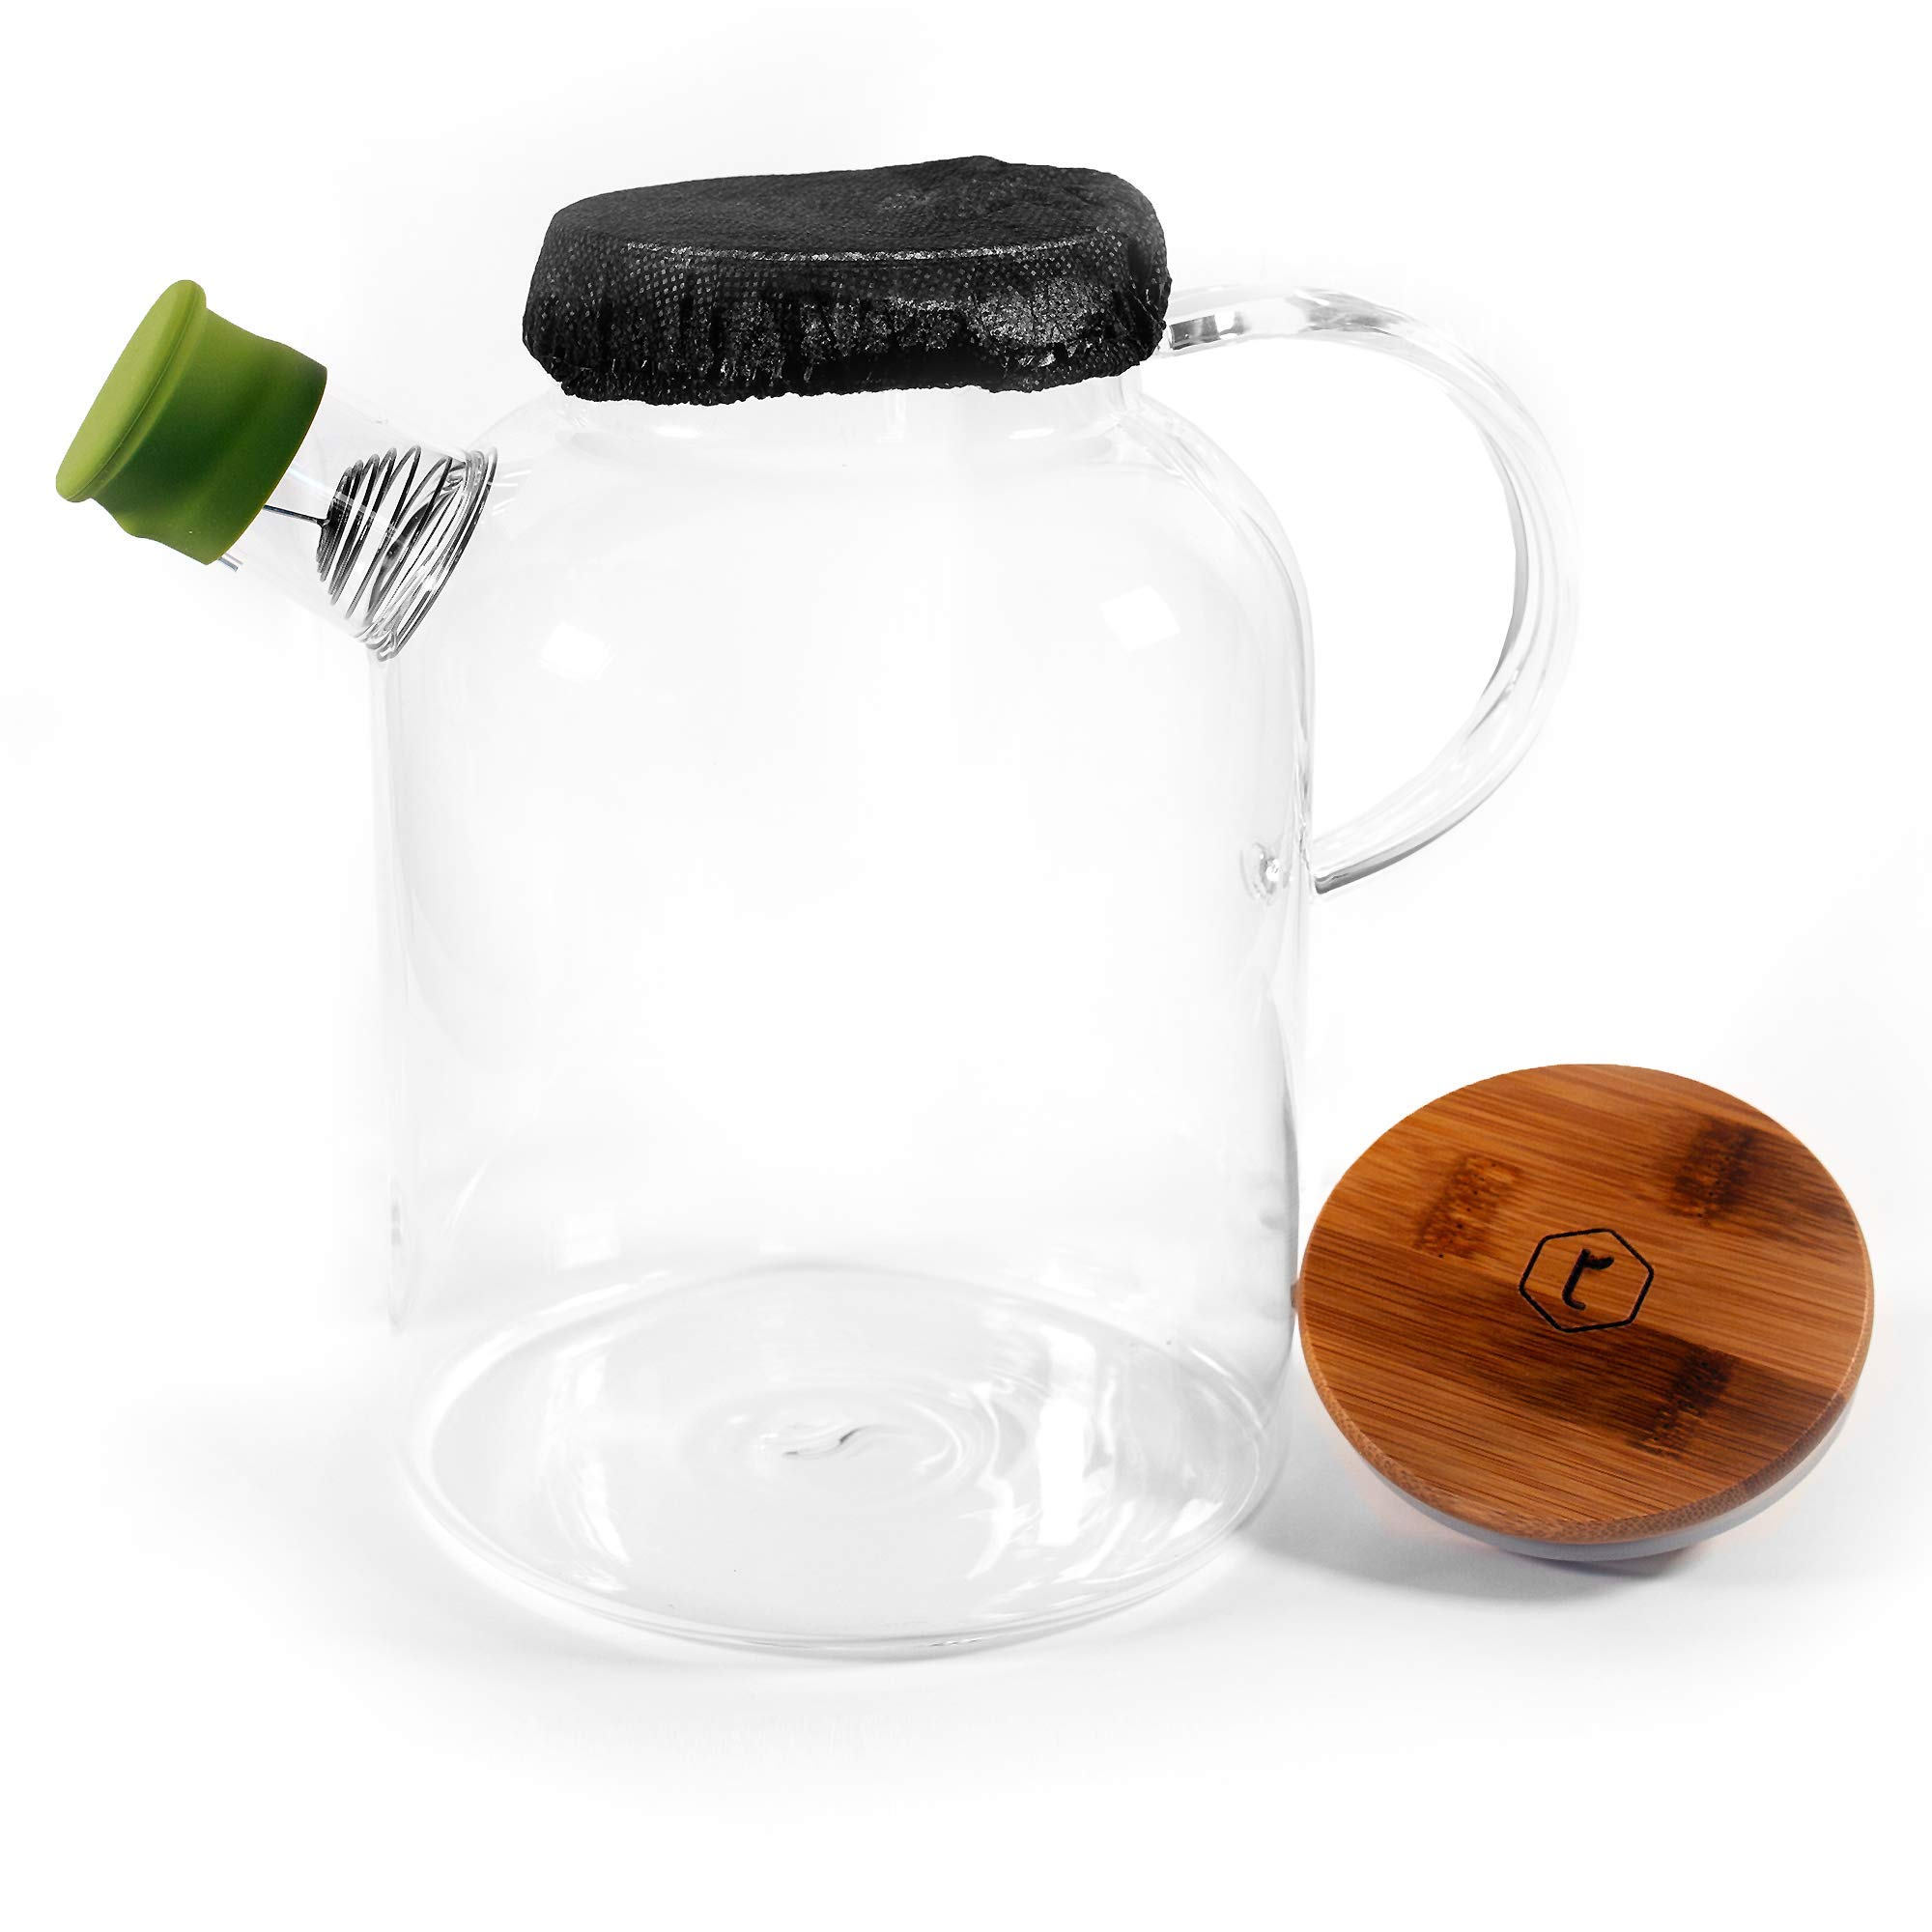 Easiest Brew & Pour Kombucha Fermentation Home Brewing Kit